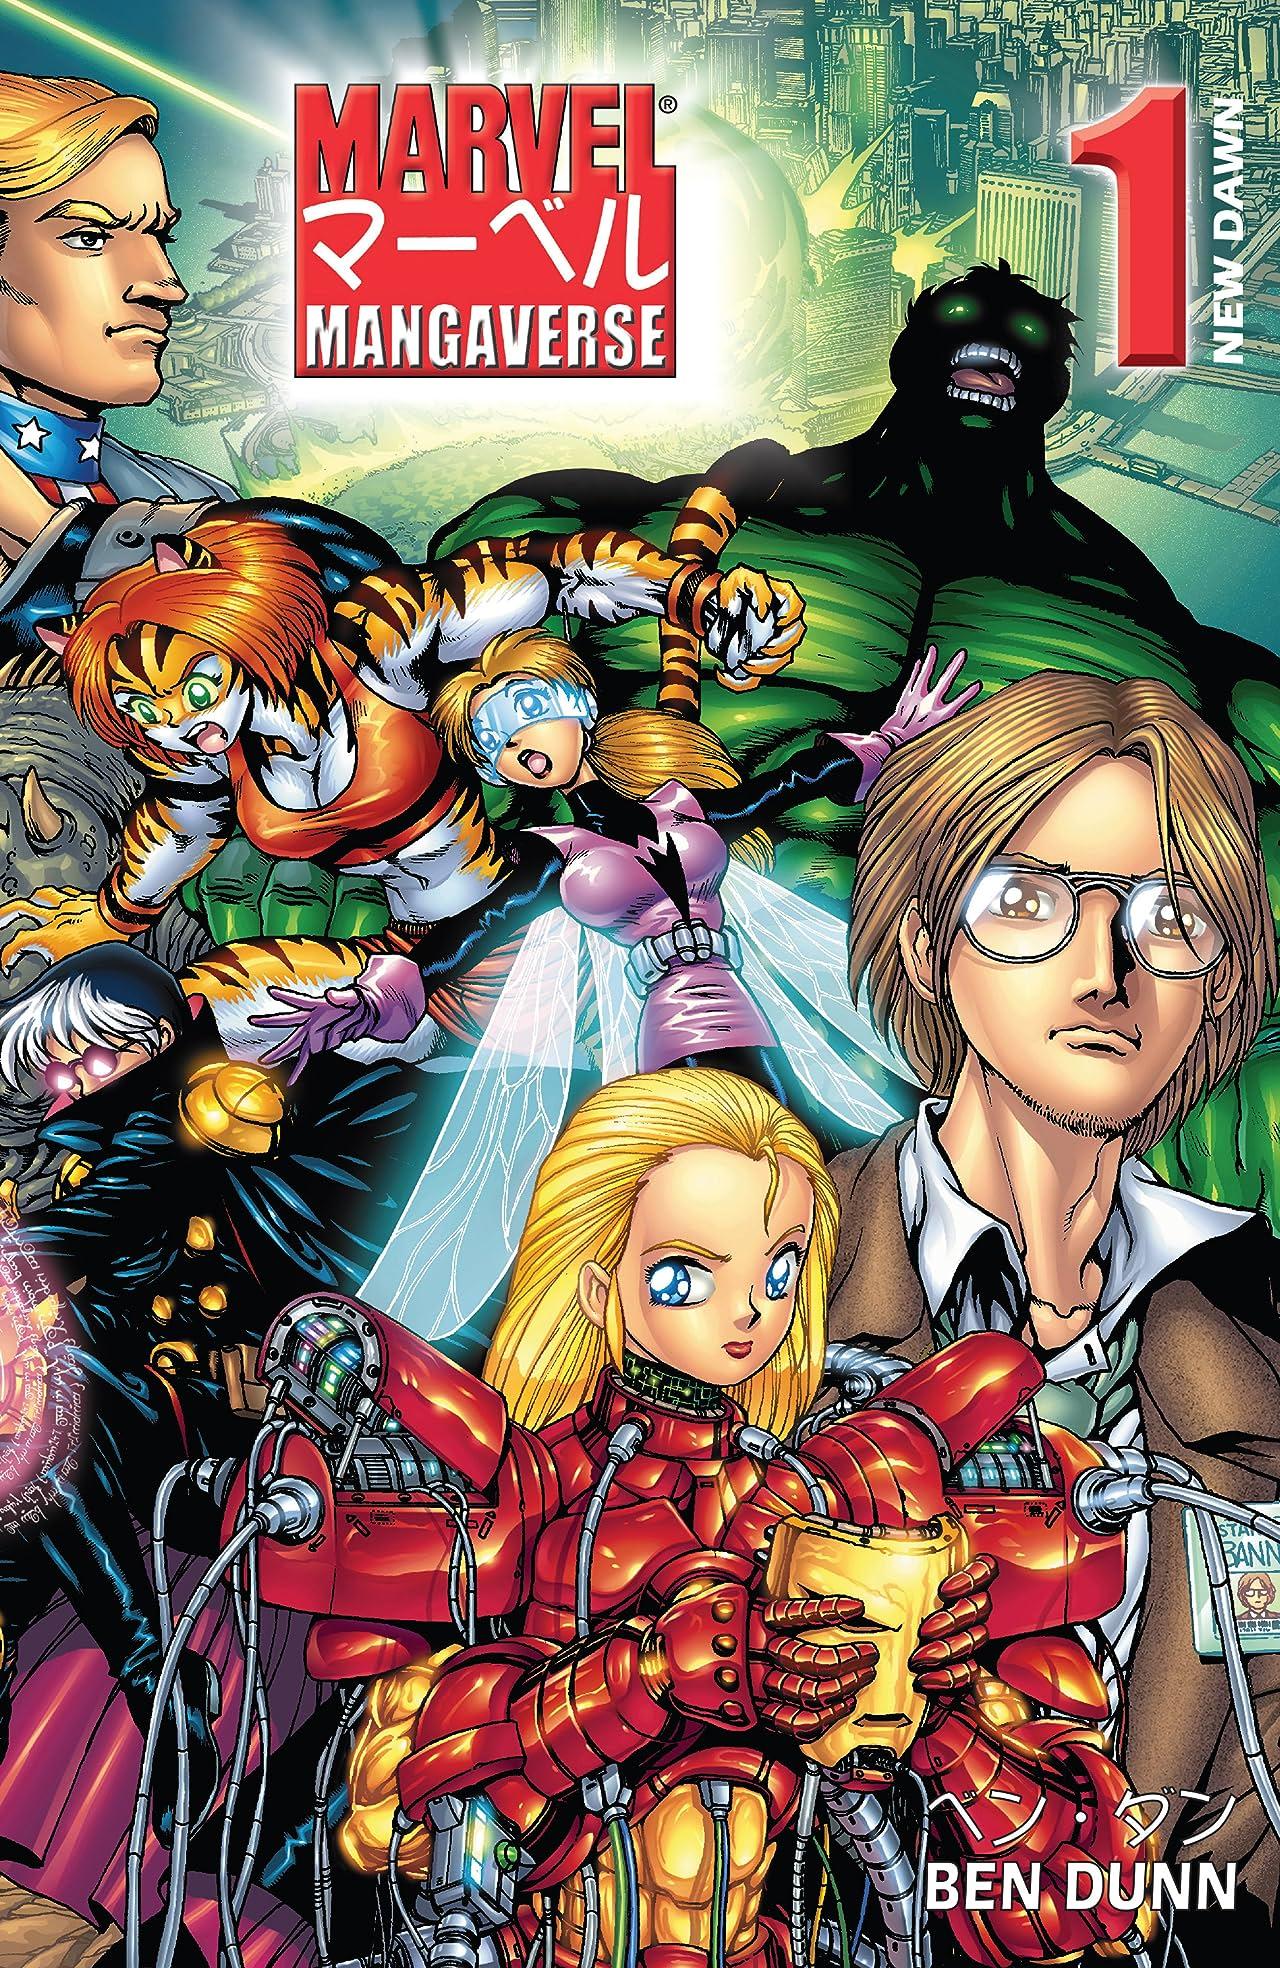 Marvel Mangaverse: New Dawn (2002) #1